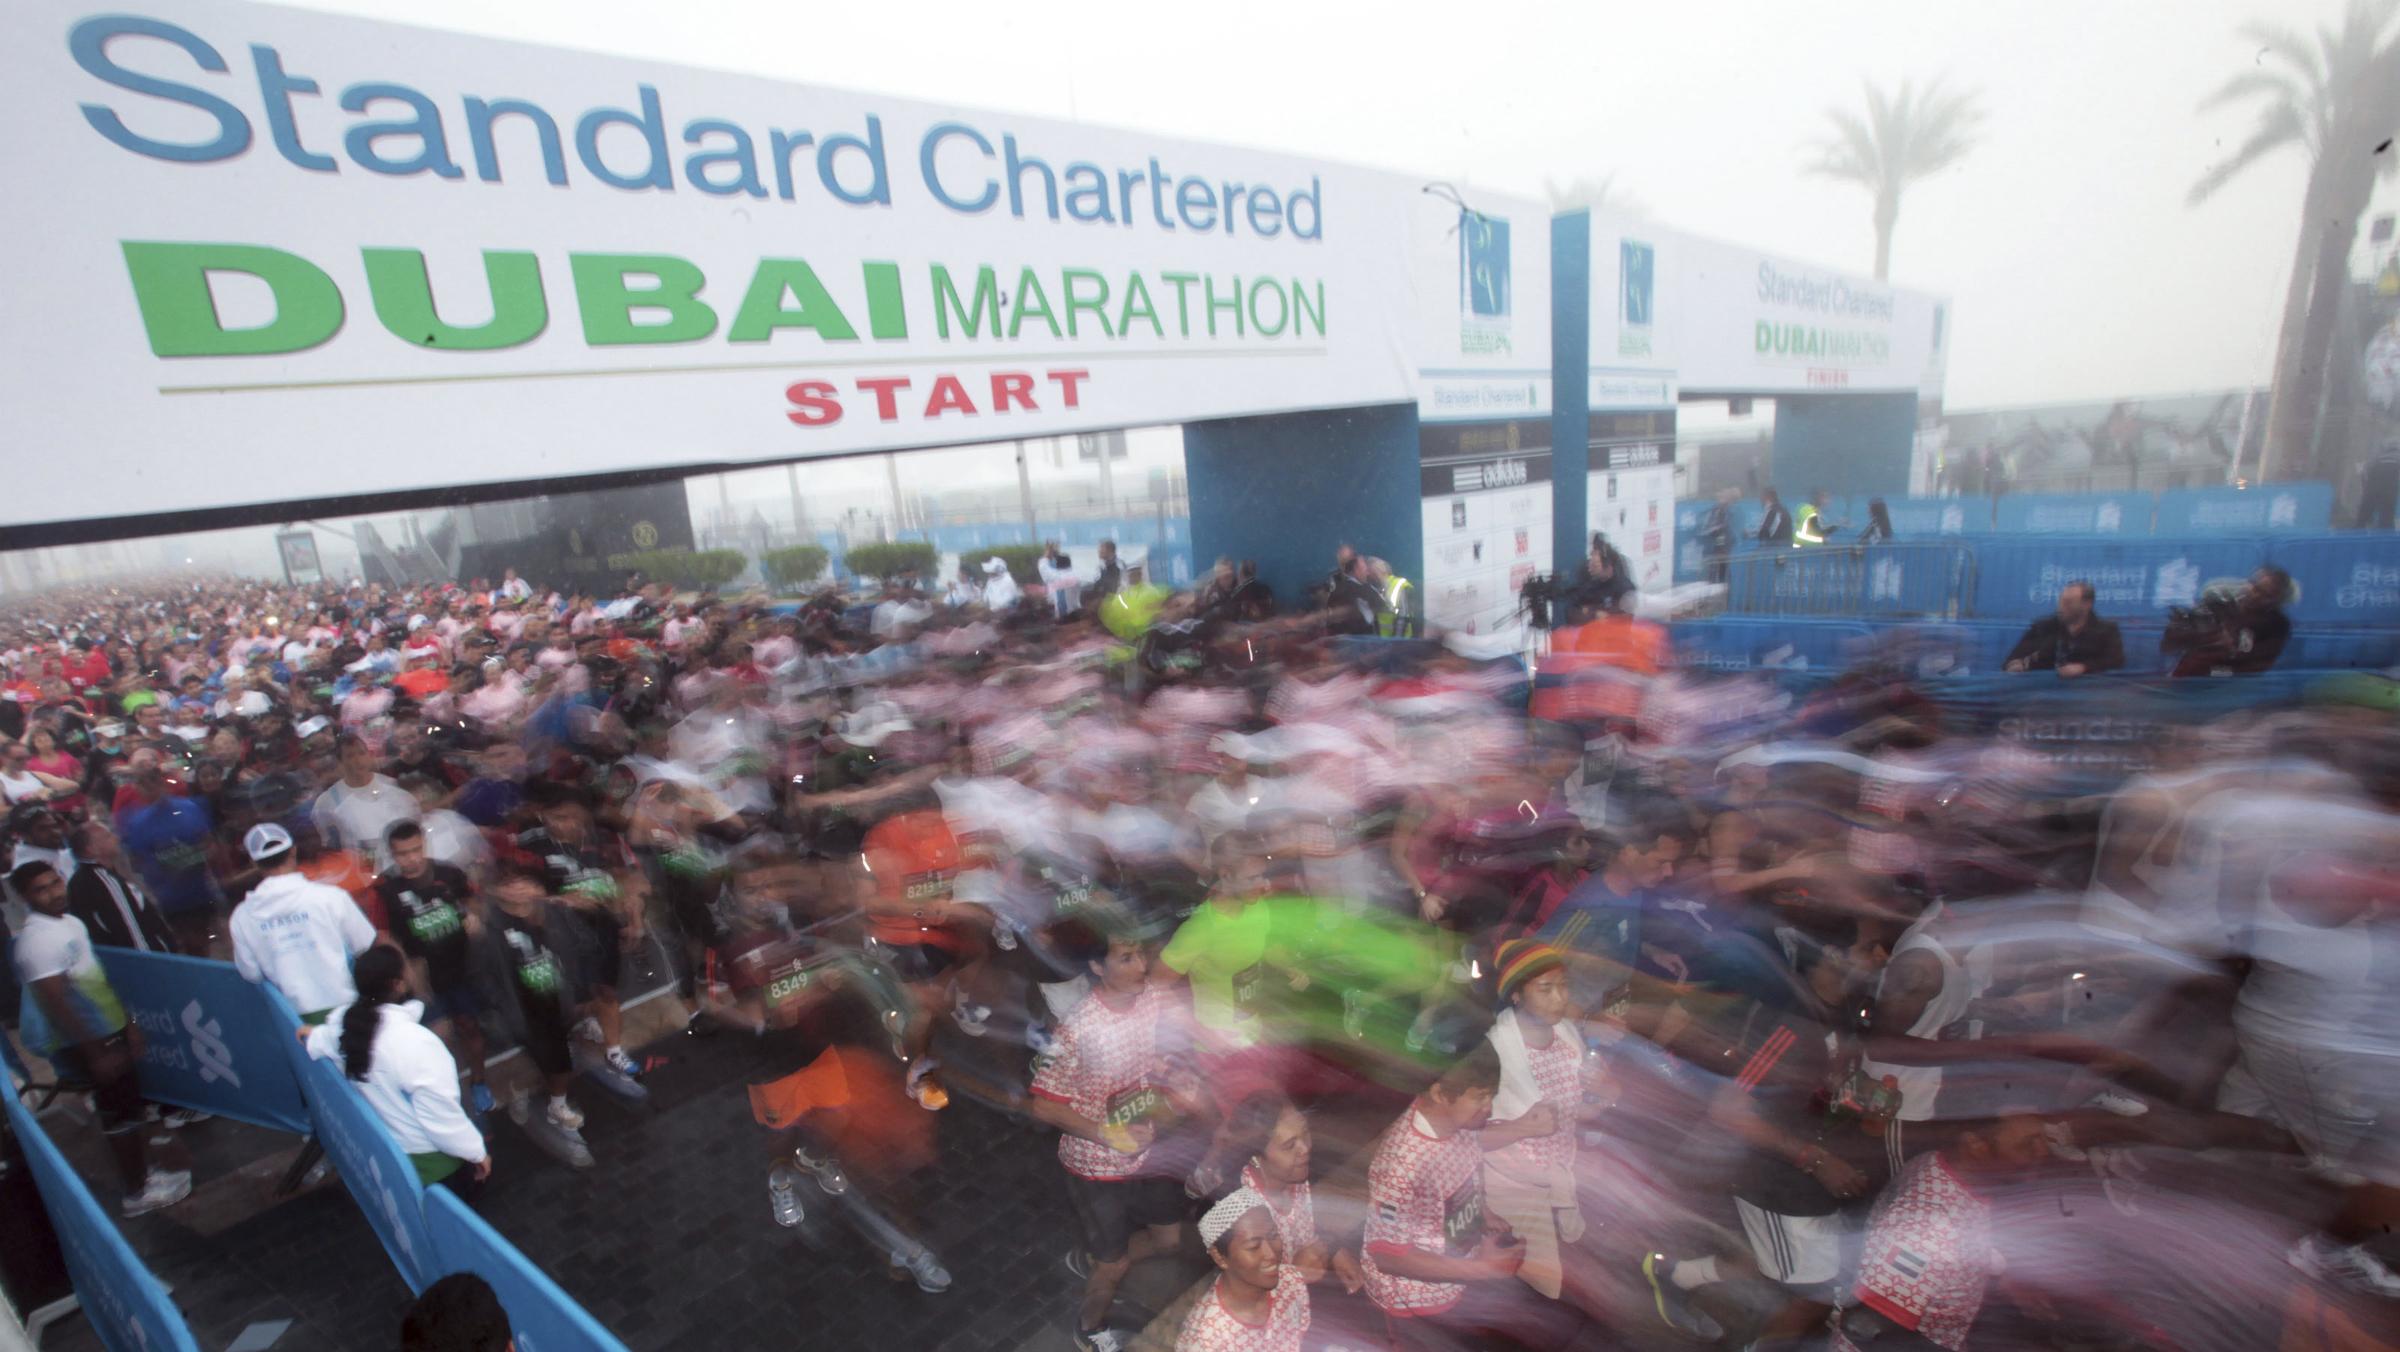 standard chartered global banking dubai marathon